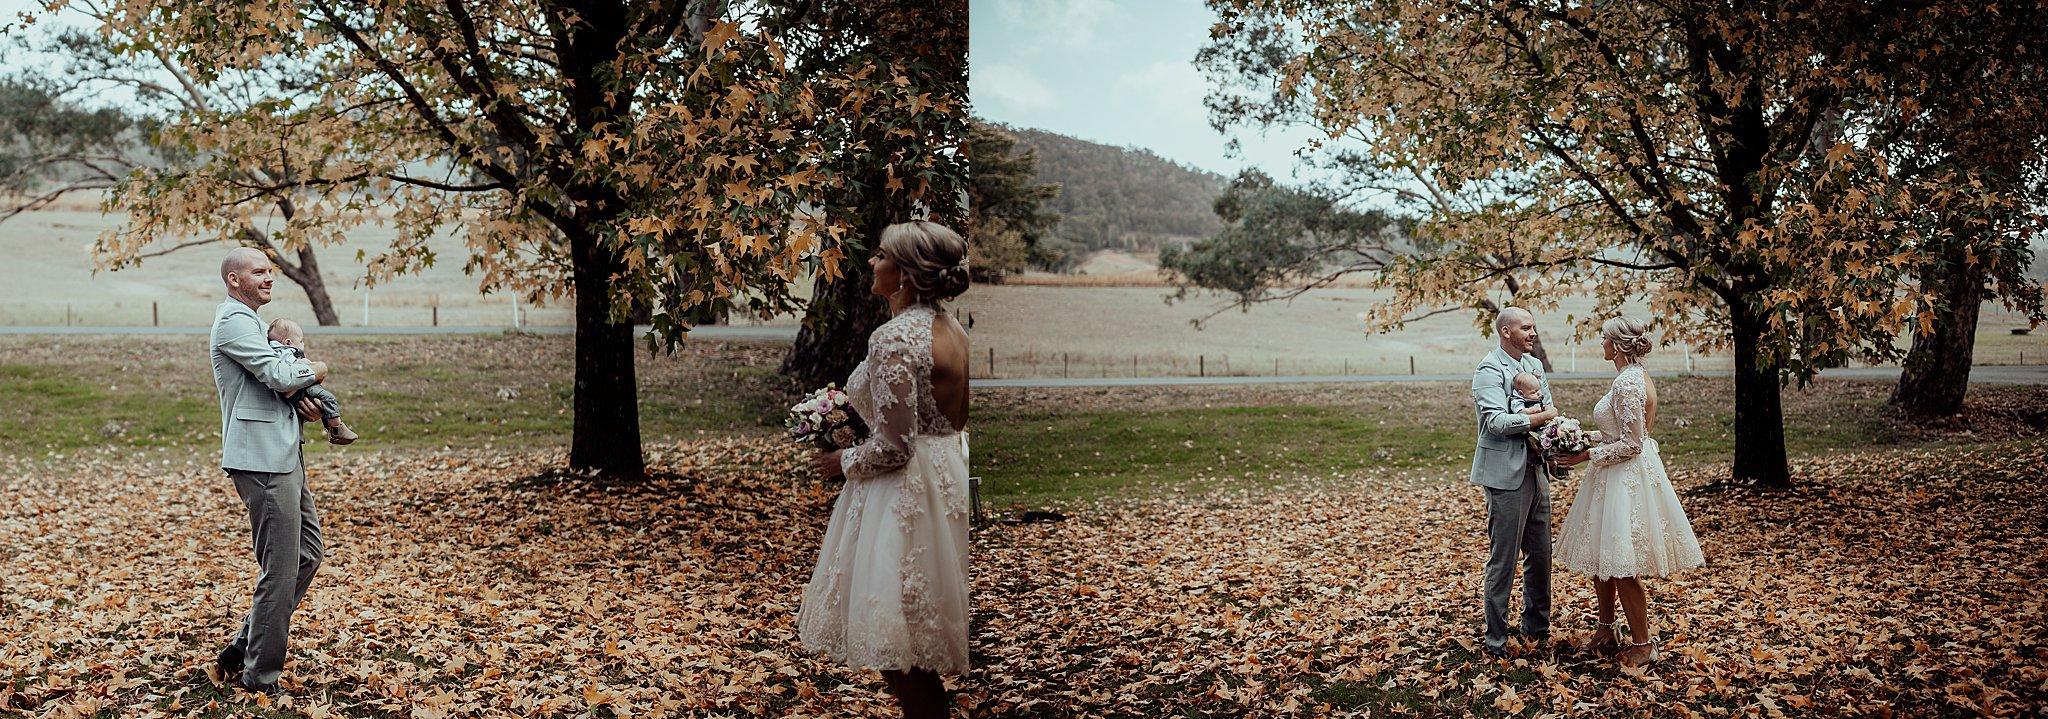 mickalathomas_puremacphotography_weddingphotographer_couplephotographer_Sheppartonphotographer_3403.jpg